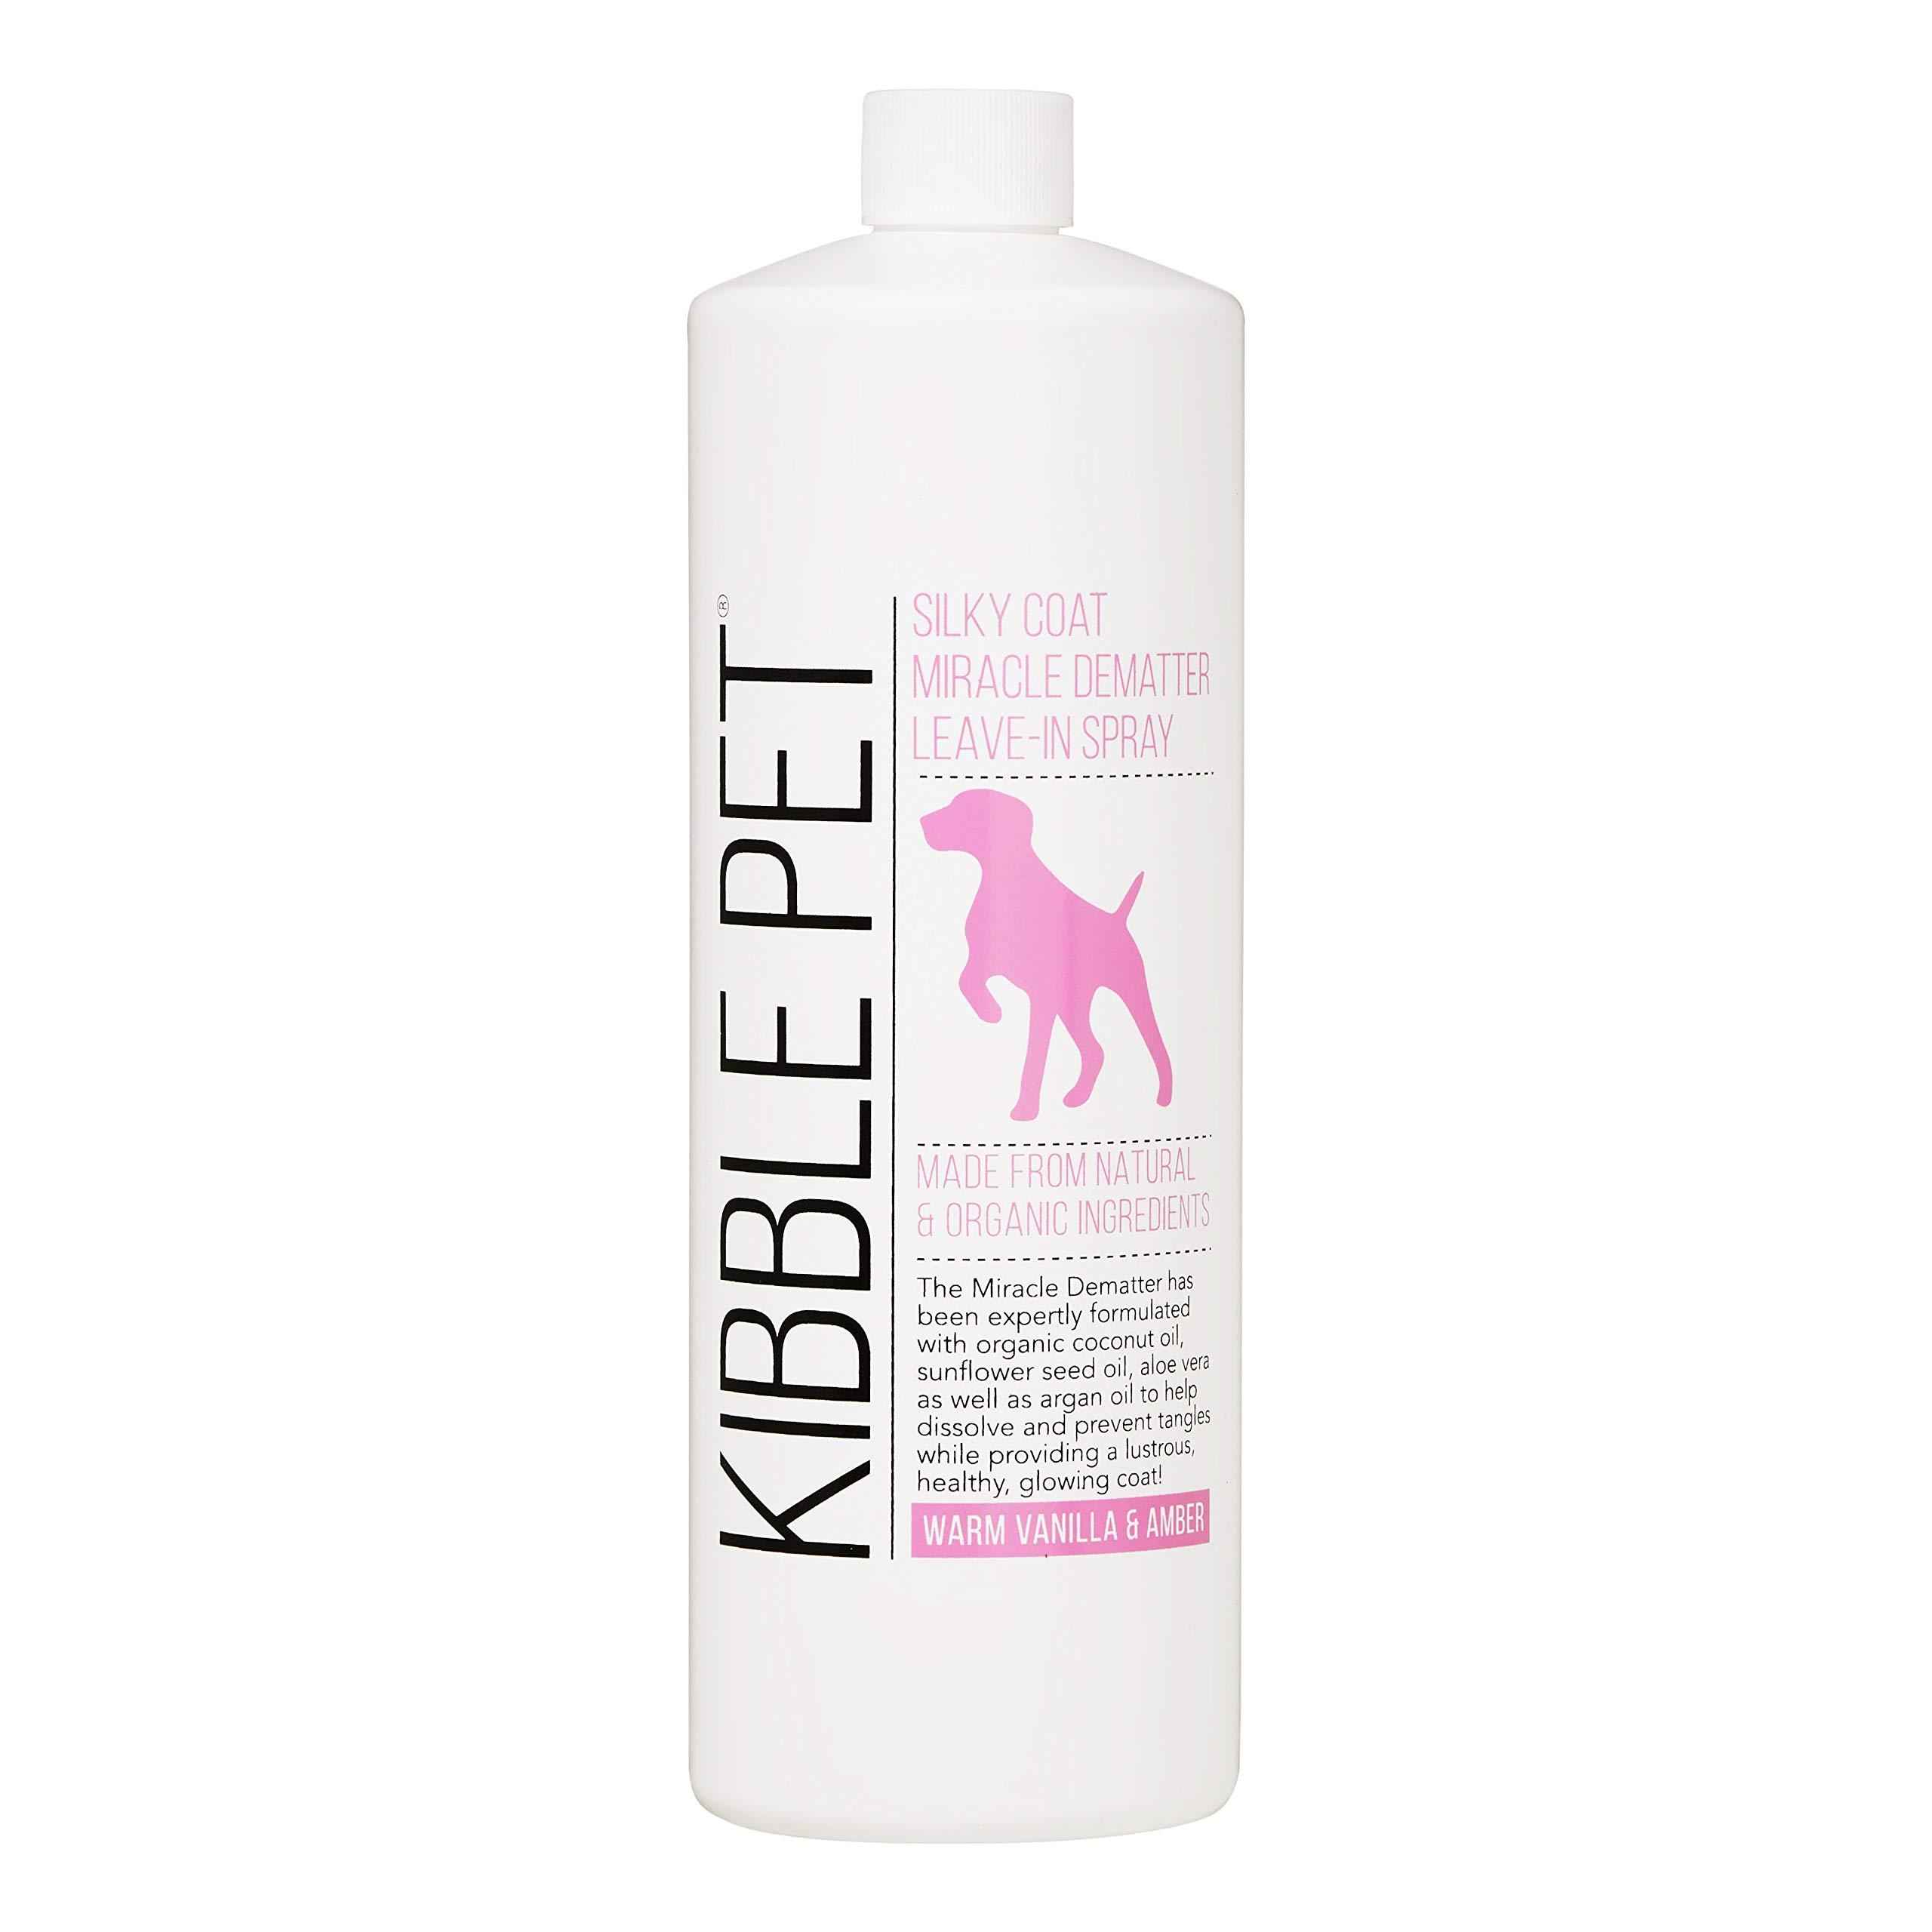 Kibble Pet Miracle Dematter - Warm Vanilla & Amber (1 L) by Kibble Pet